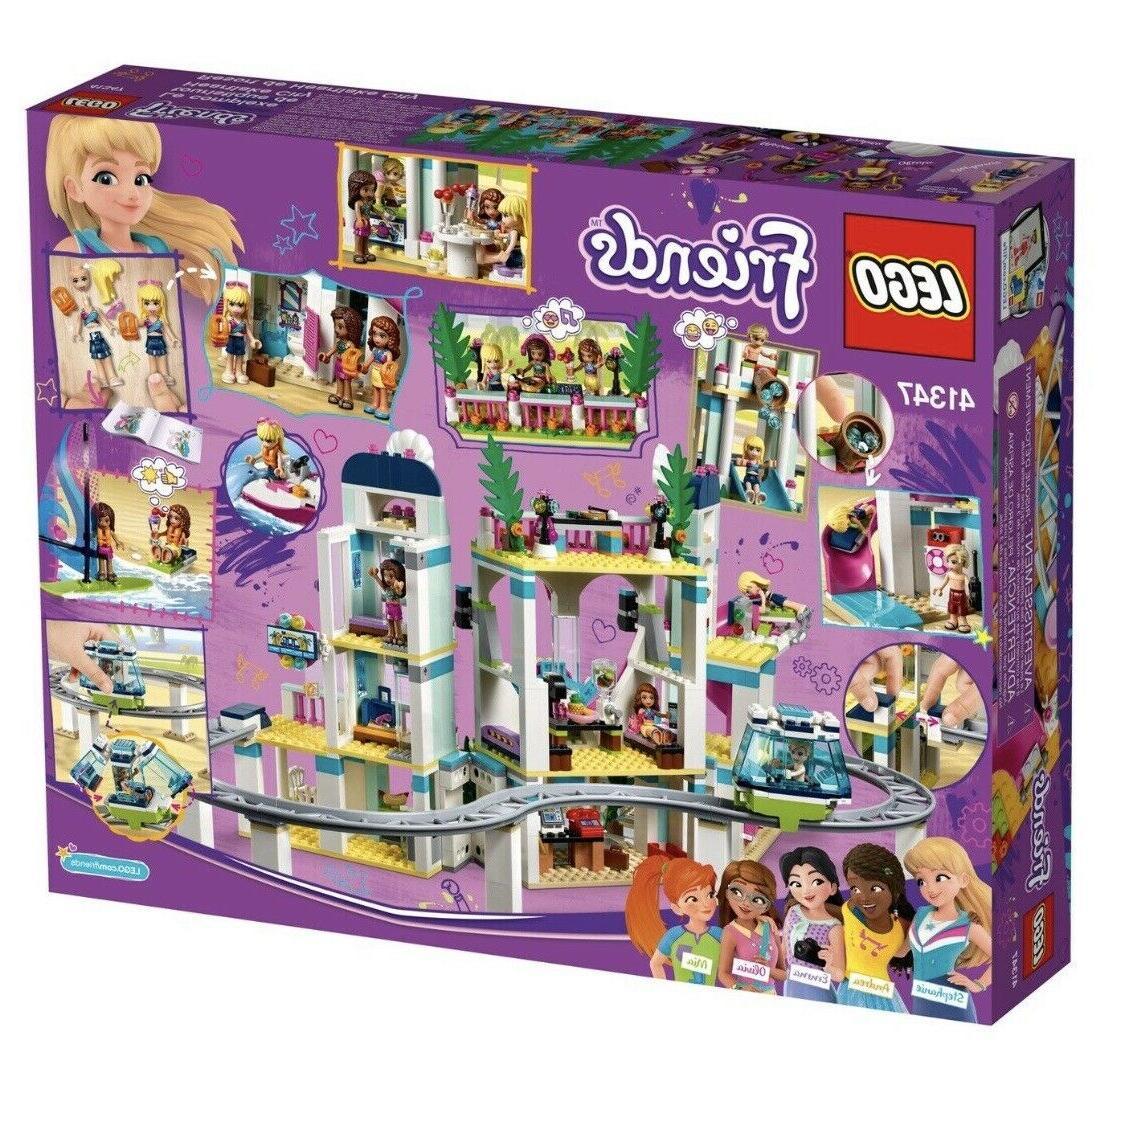 LEGO® Friends Heartlake City Waterpark Sets for Girls